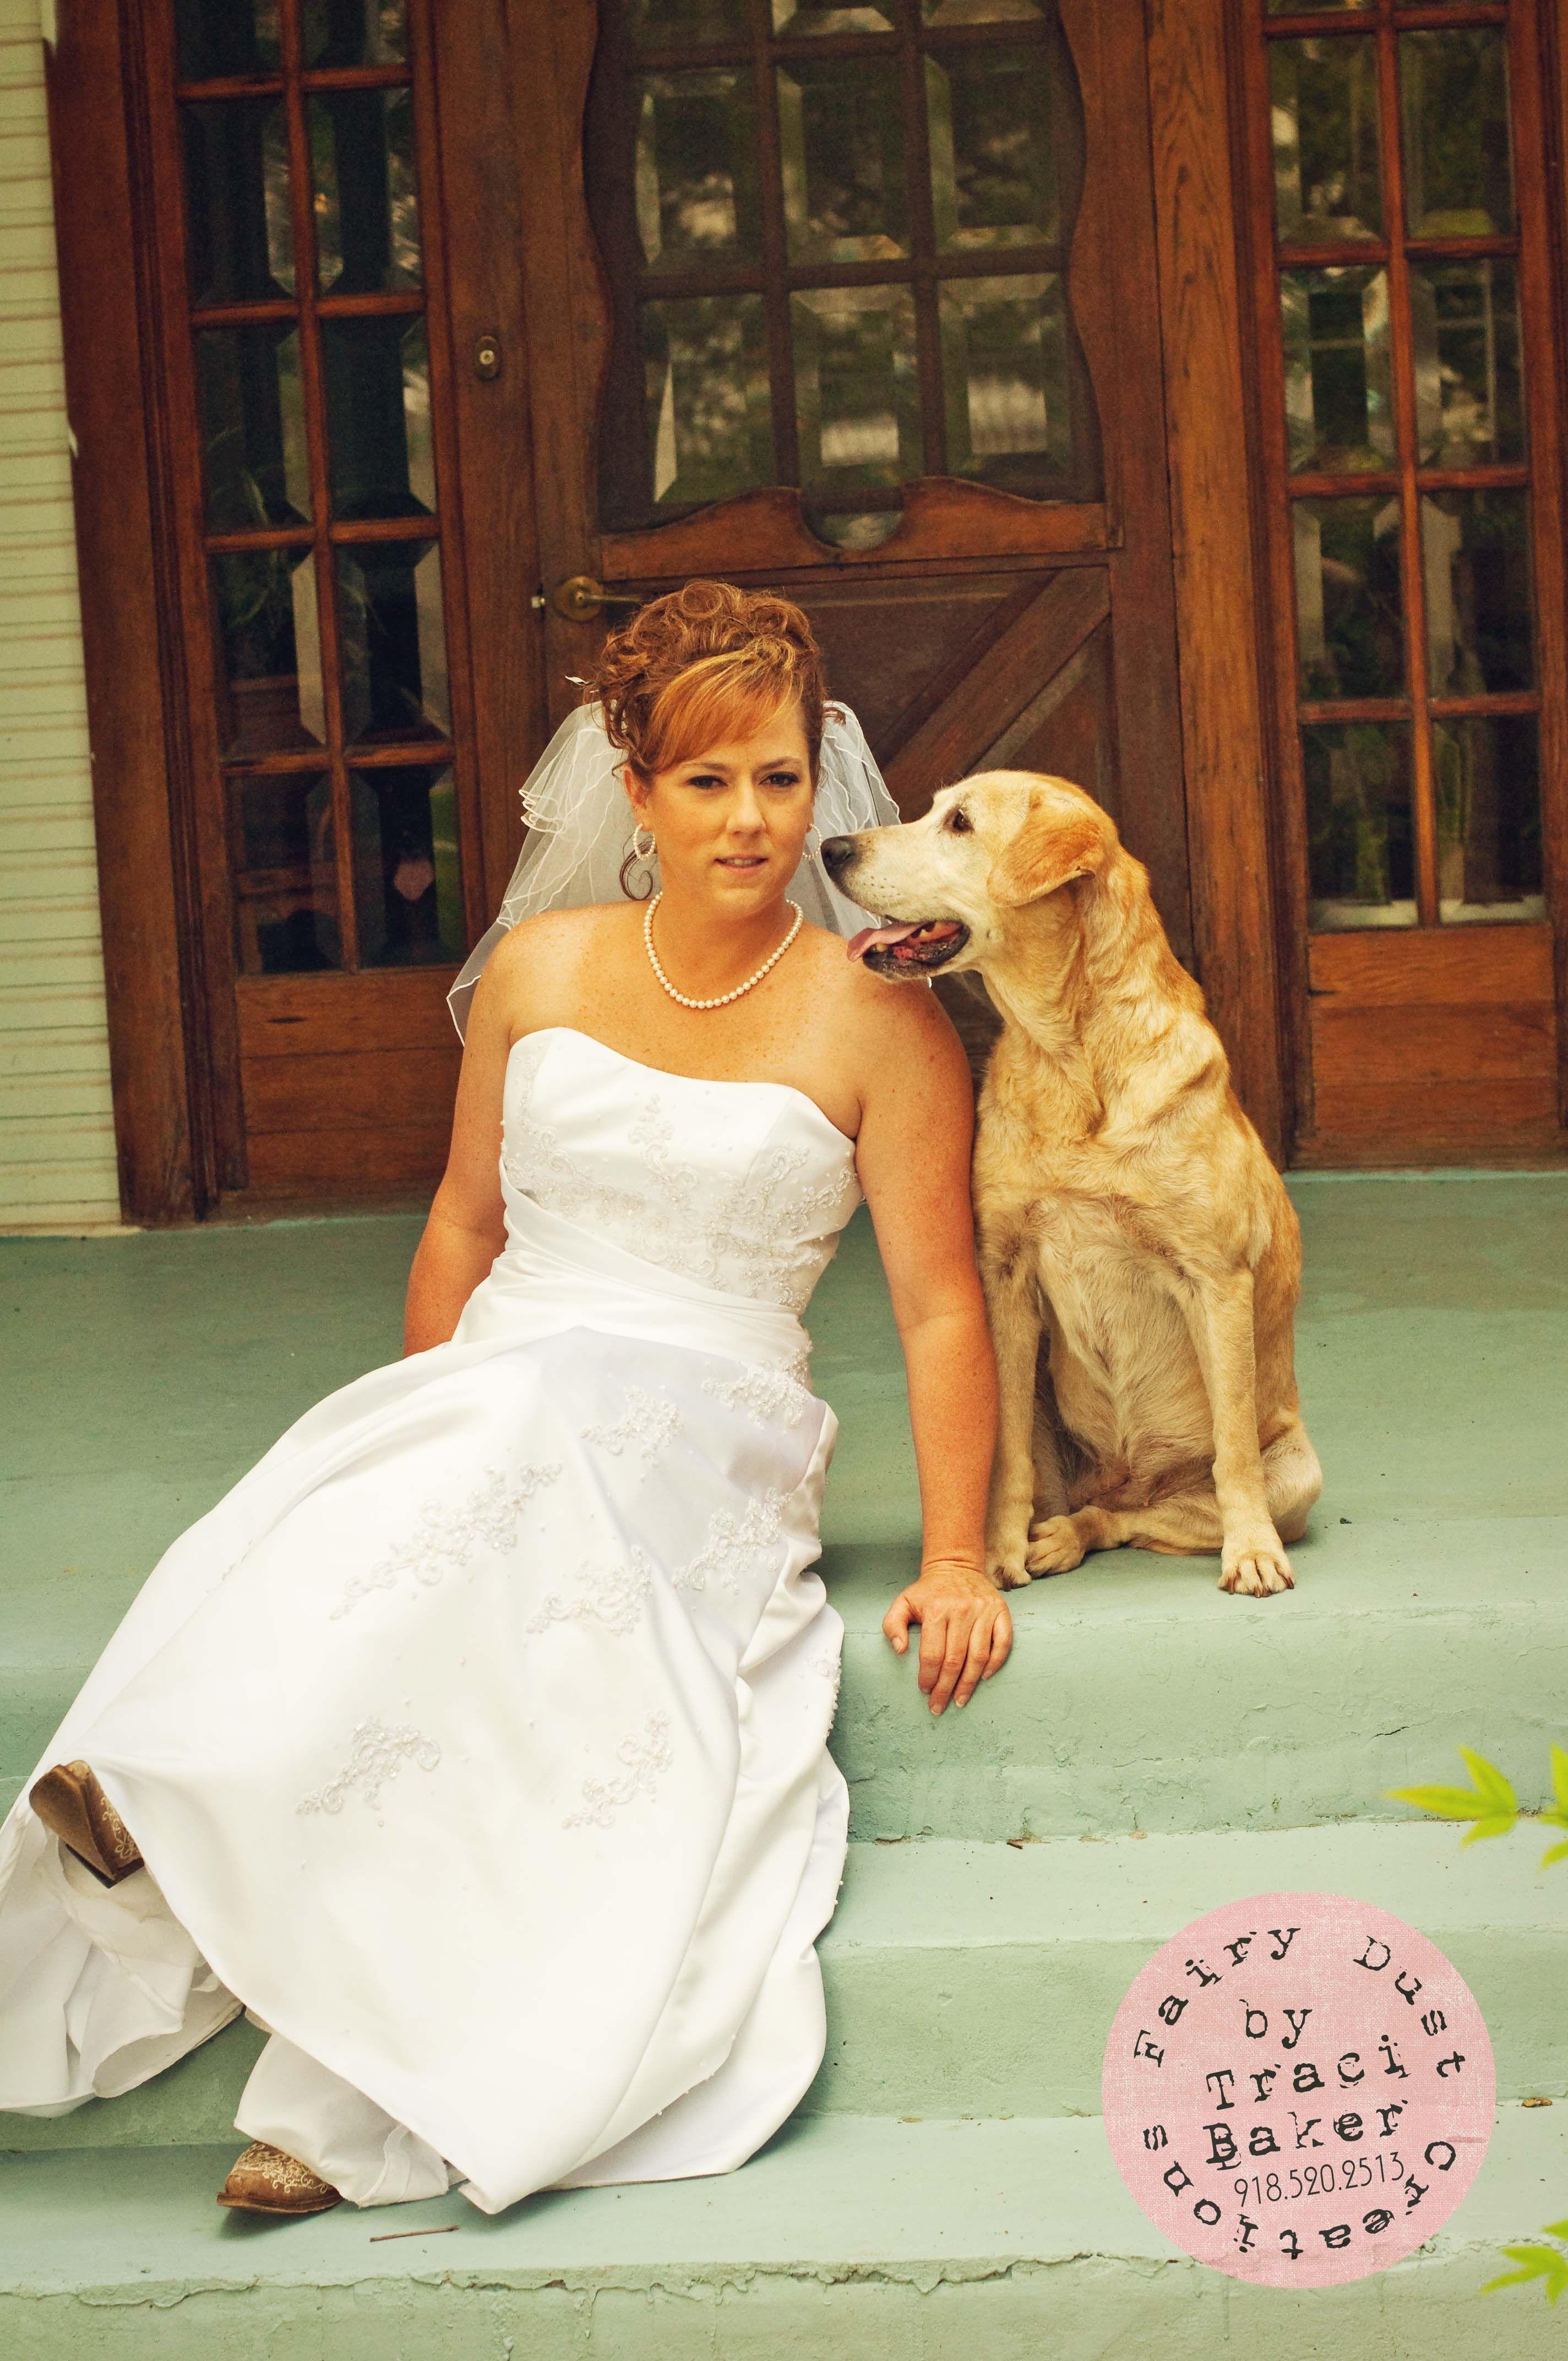 Ridiculous wedding dresses  Bride with her beloved dog wedding dogs pet  acibaker